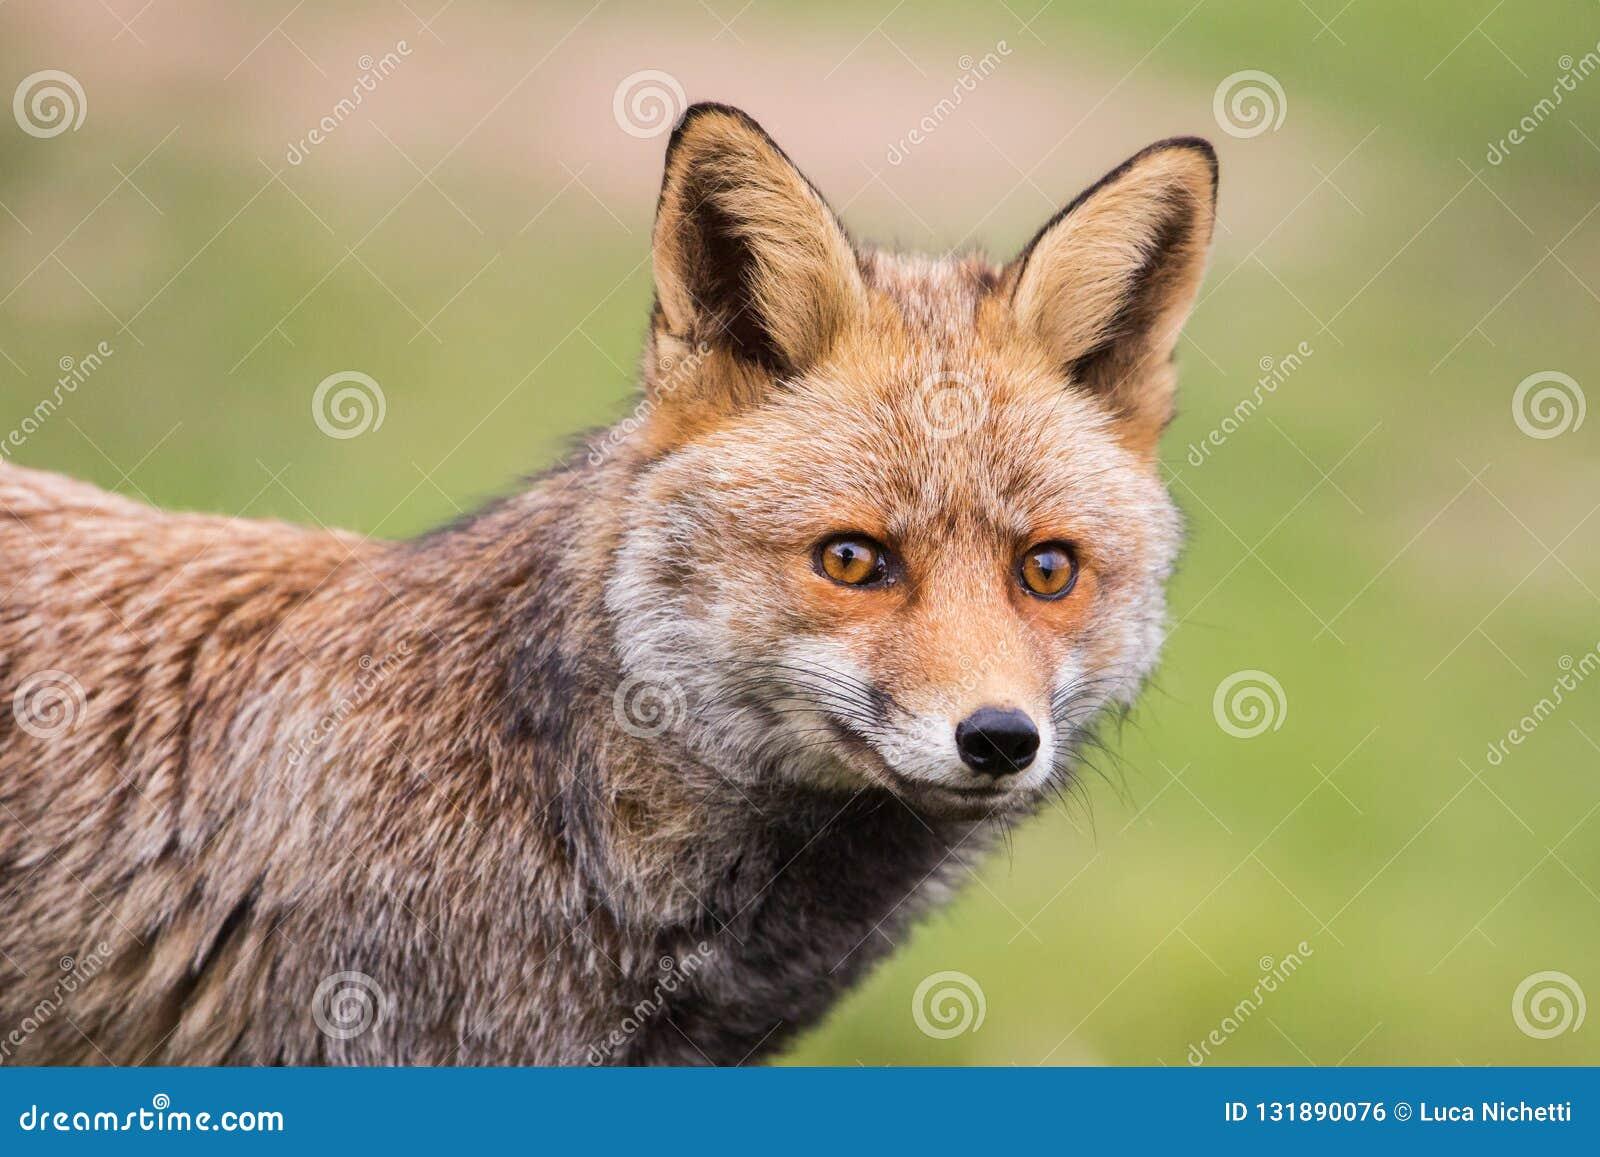 Red Fox (Vulpes vulpes) staring at camera, Andalucia, Spain royalty free stock image